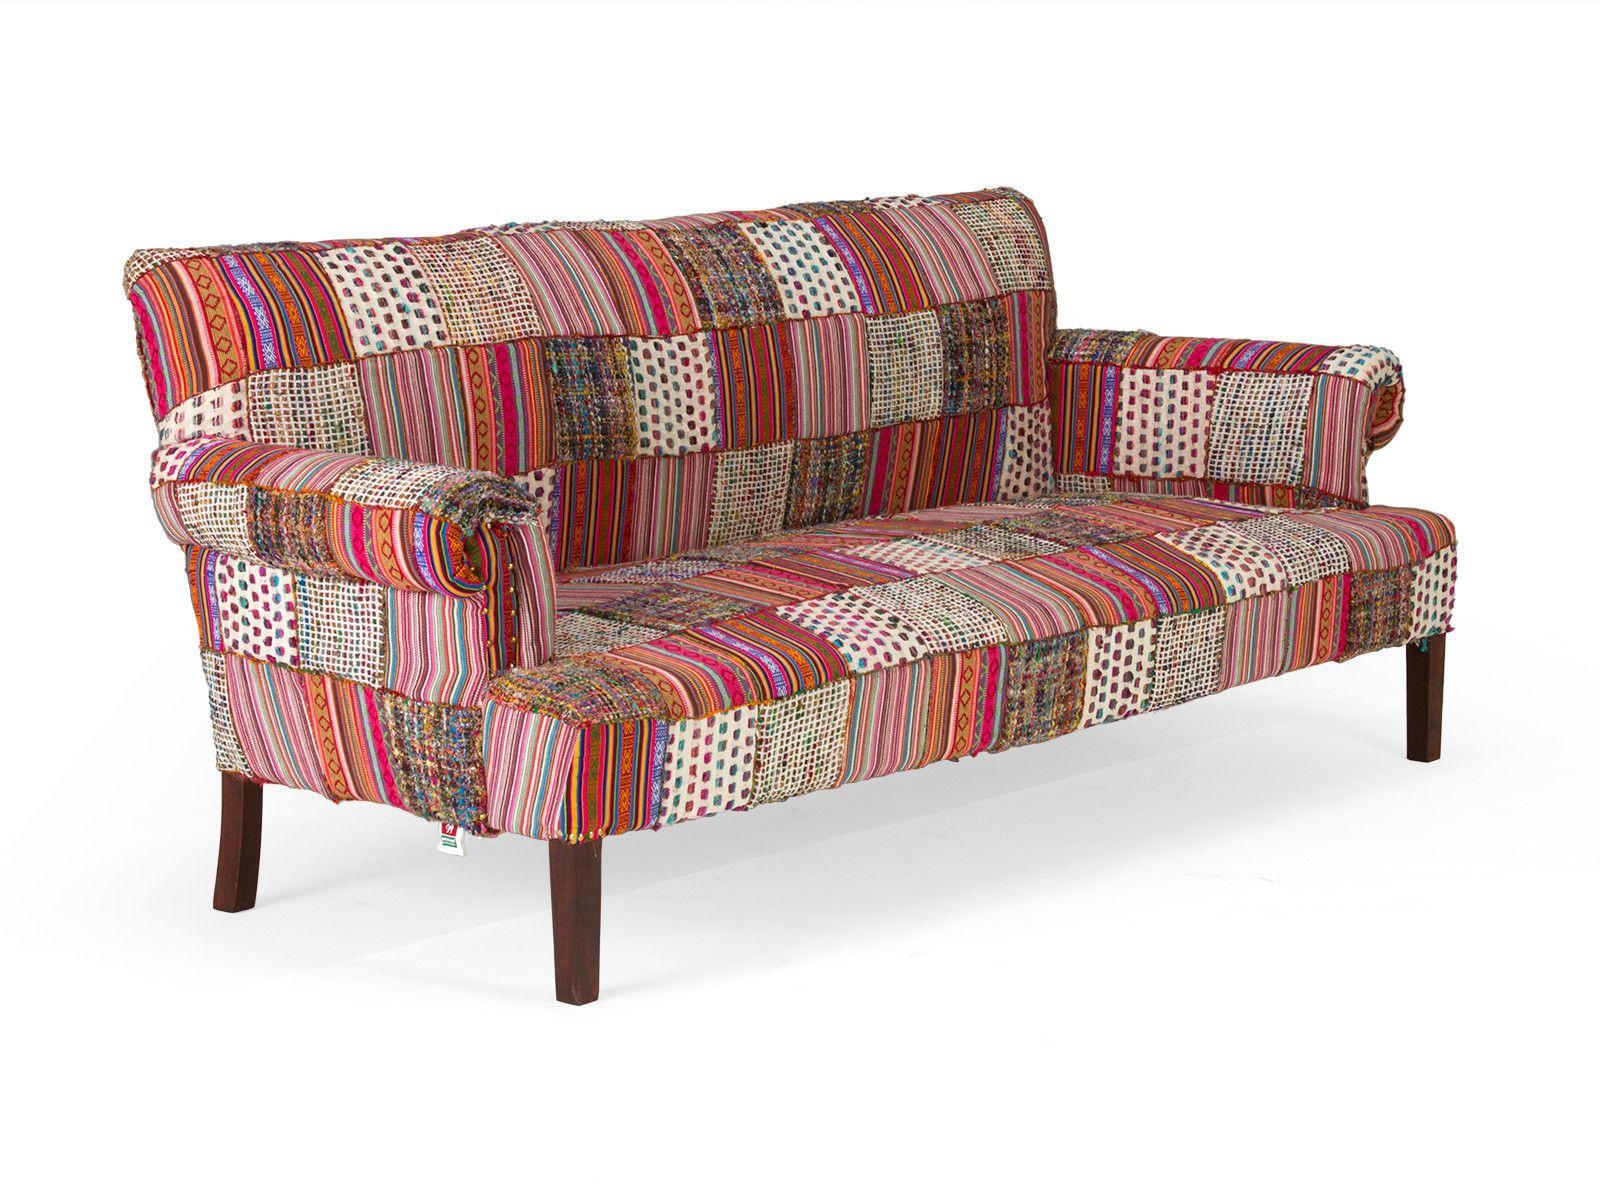 Patchwork Sofa Florese 3-Sitzer von massivum.de   Patchwork   Pinterest